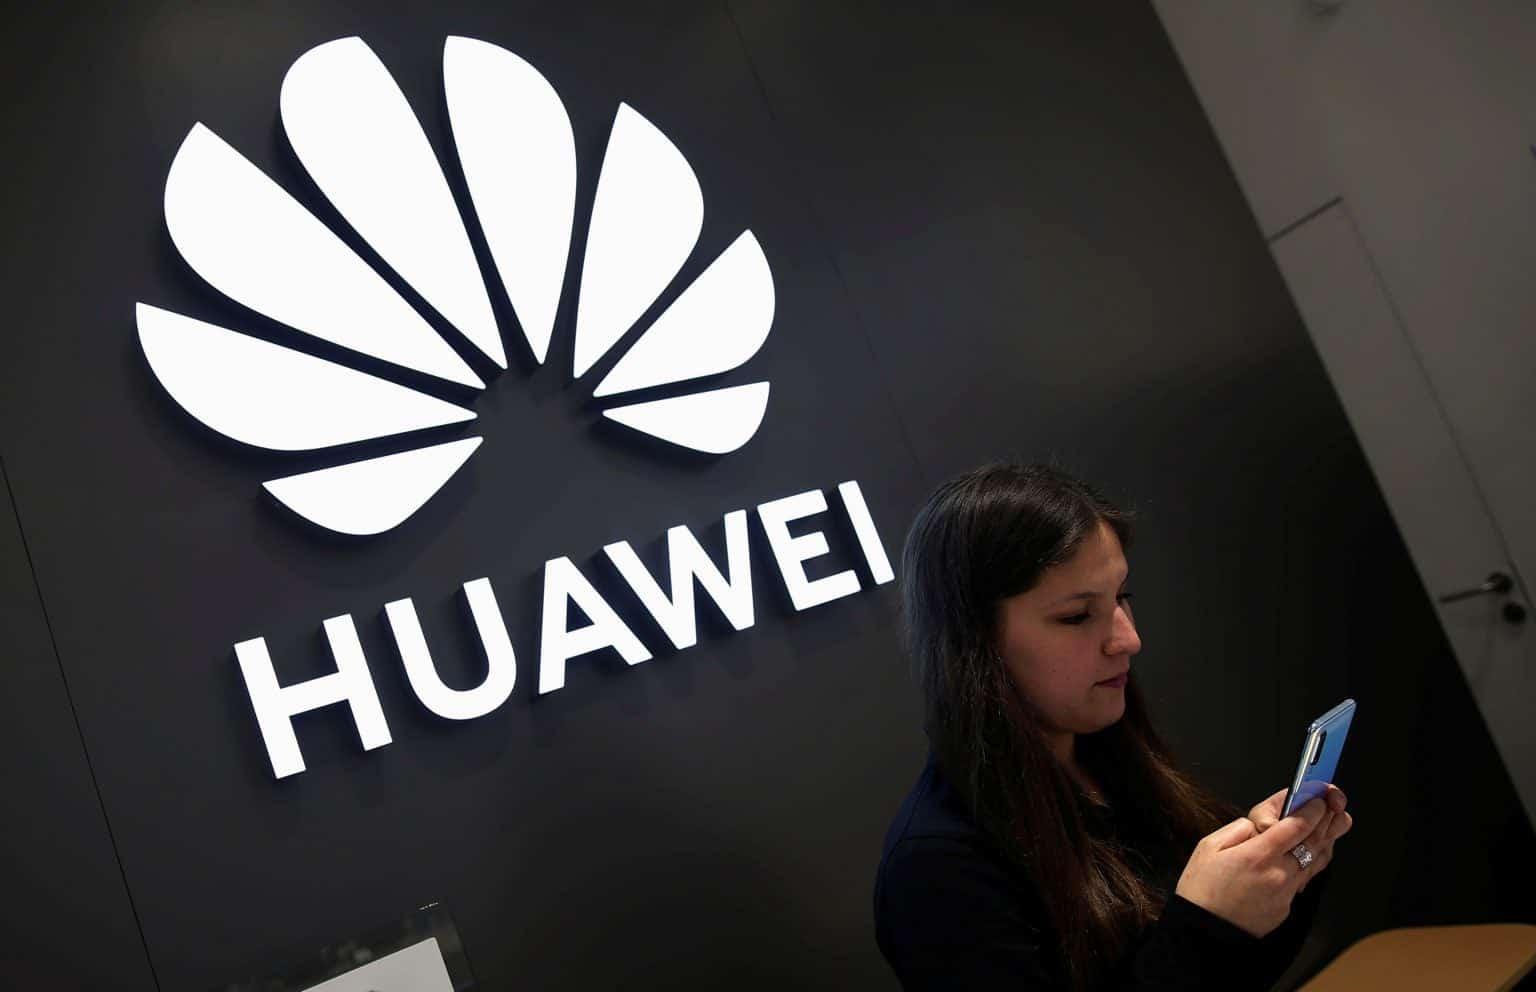 Huawei ستسبدال ويندوز 10 ب HARMONY OS 2.0 في أجهزة الكمبيوتر الخاصة بها